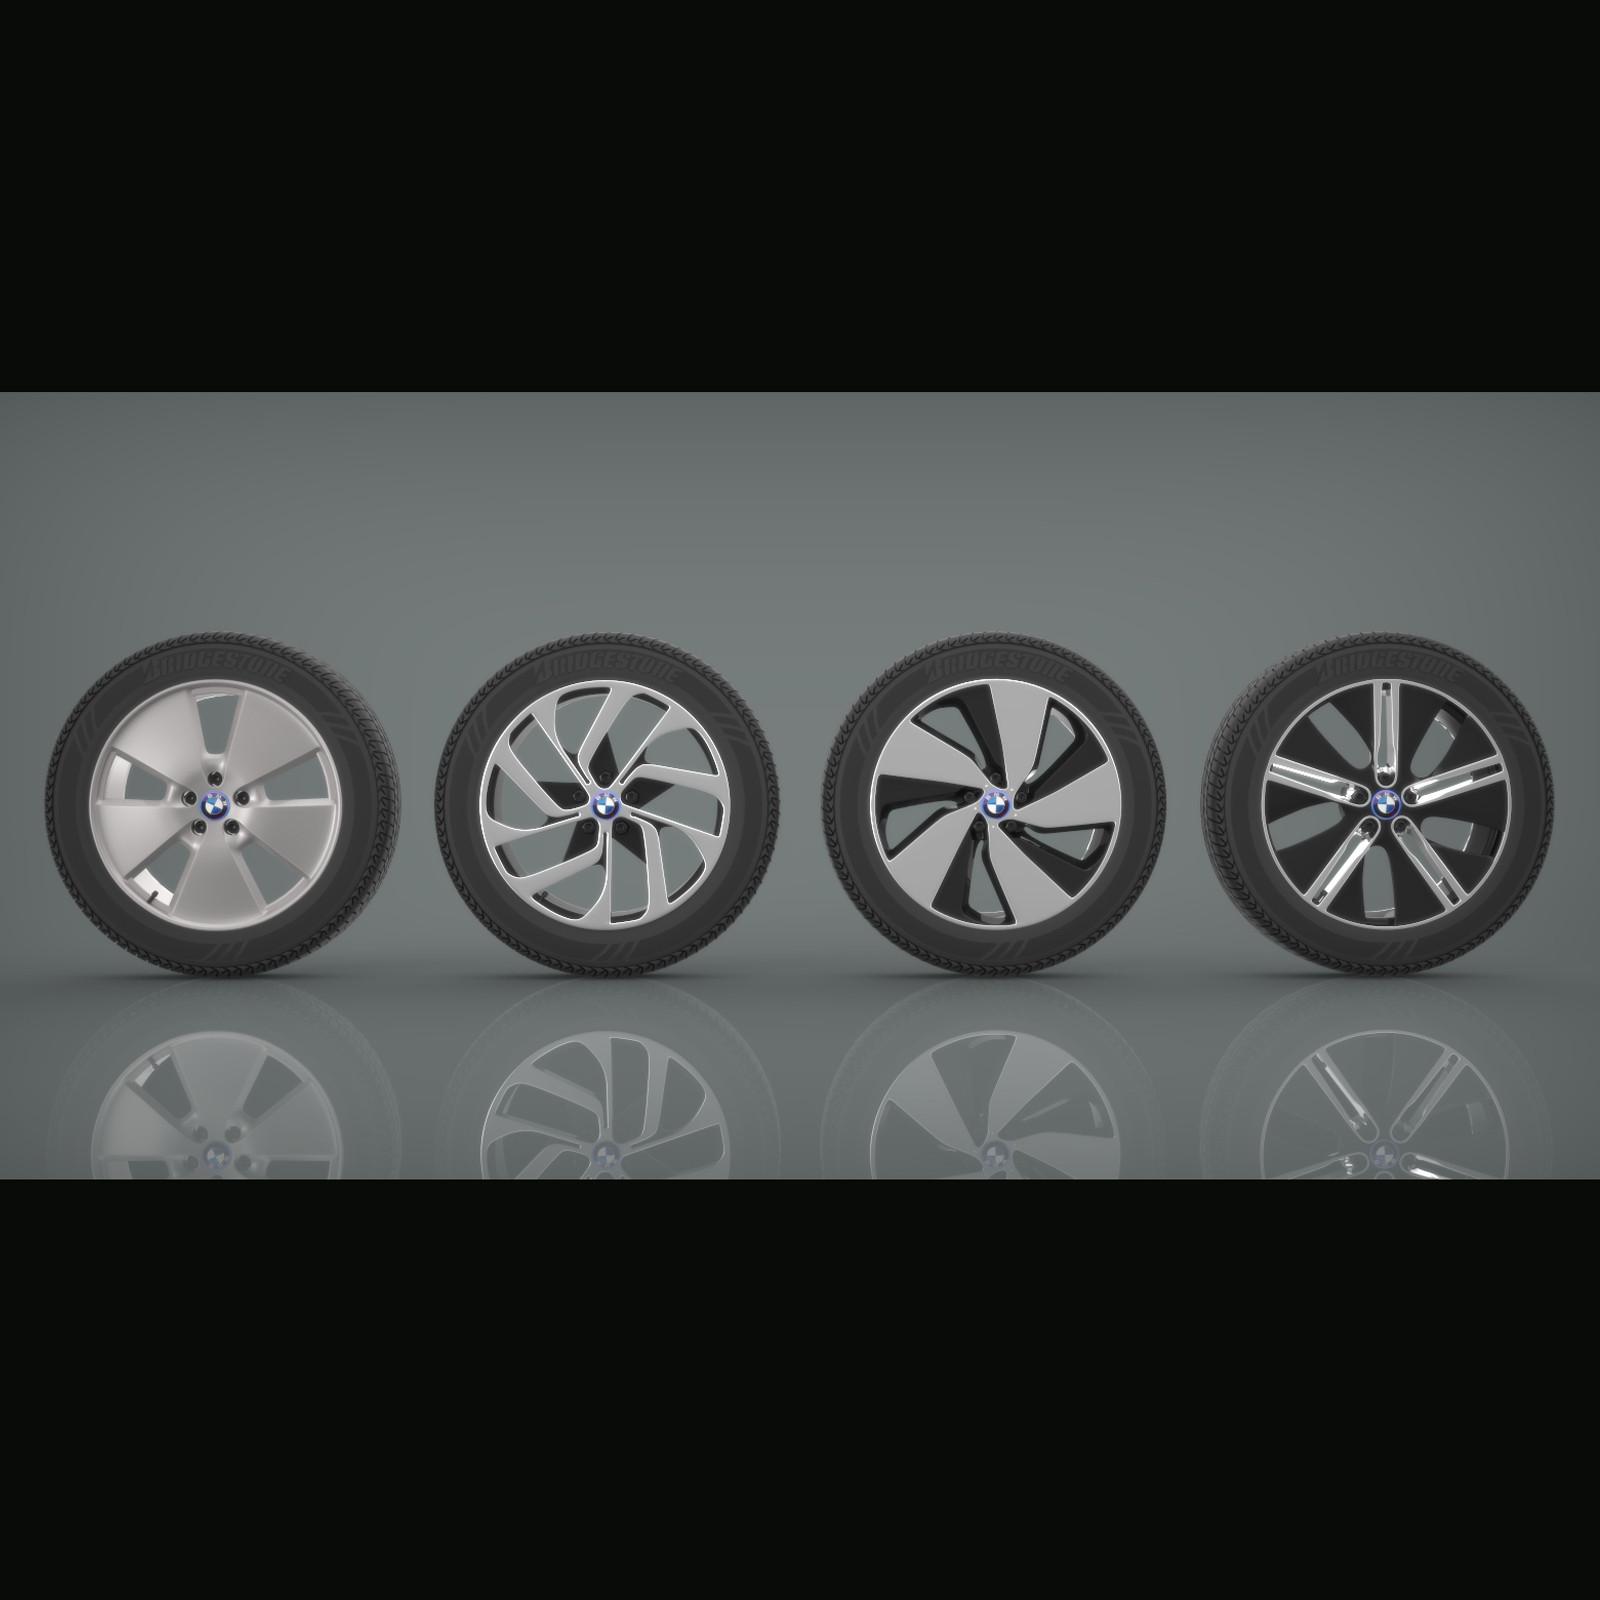 BMW i3 Rim Collection